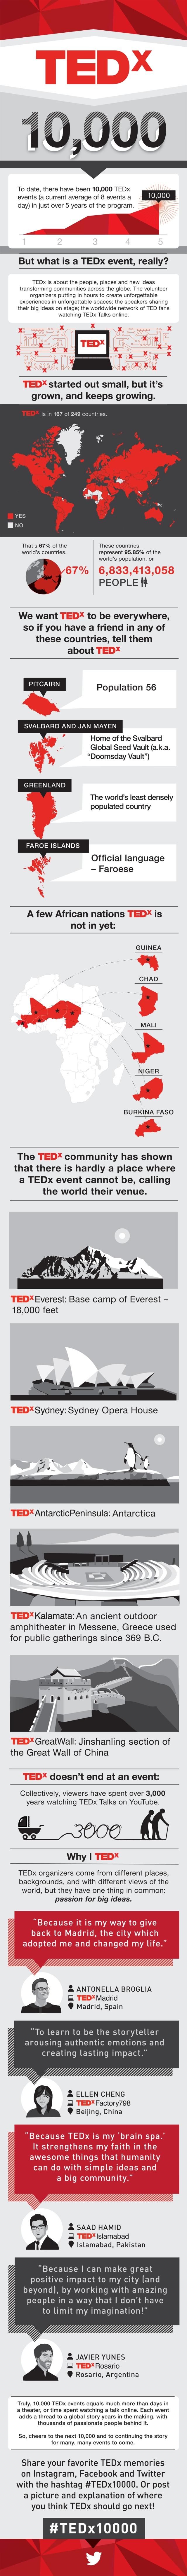 TEDx10000_FINAL-medium